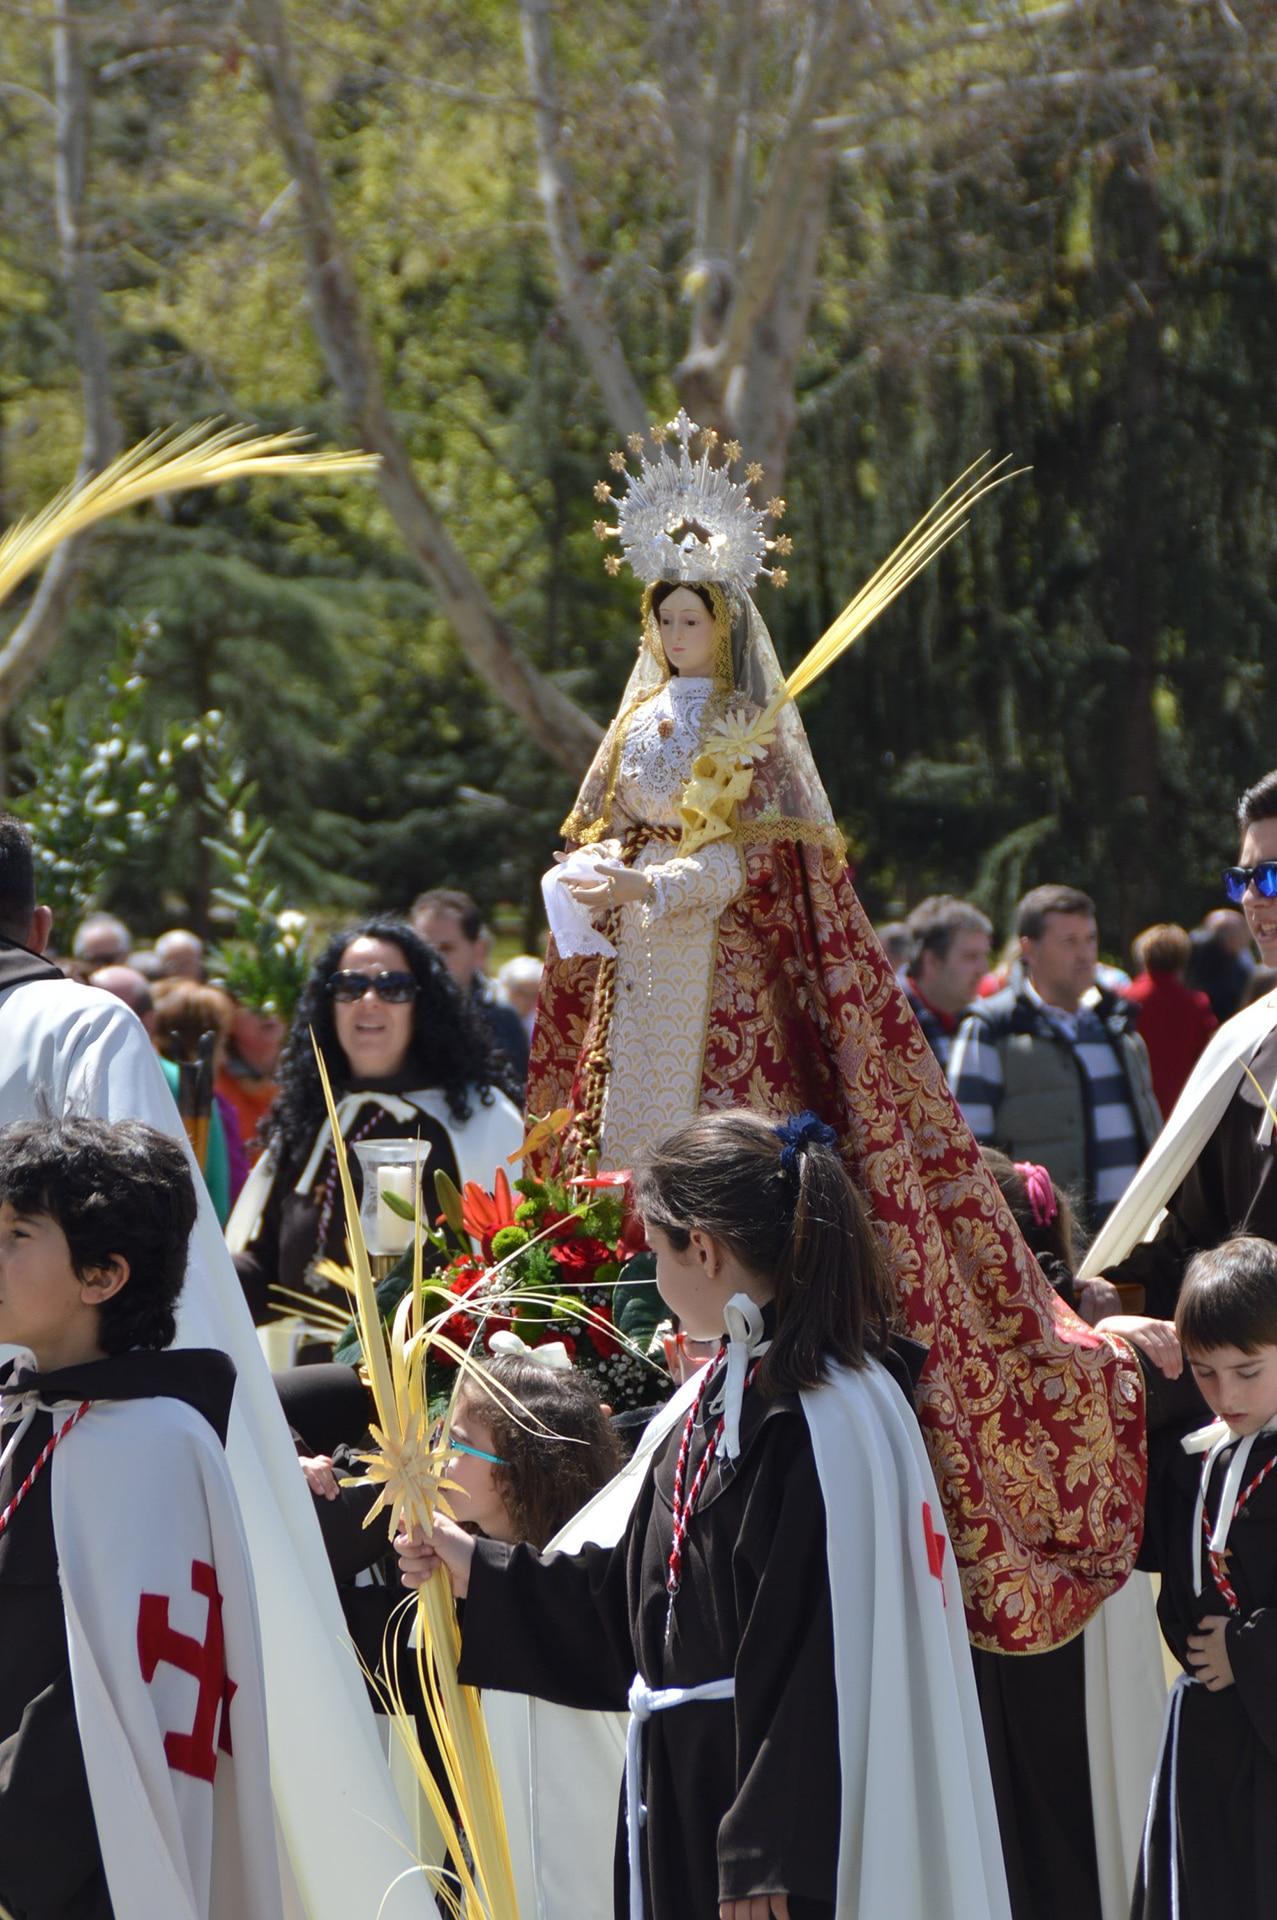 La Borriquilla, Ávila2